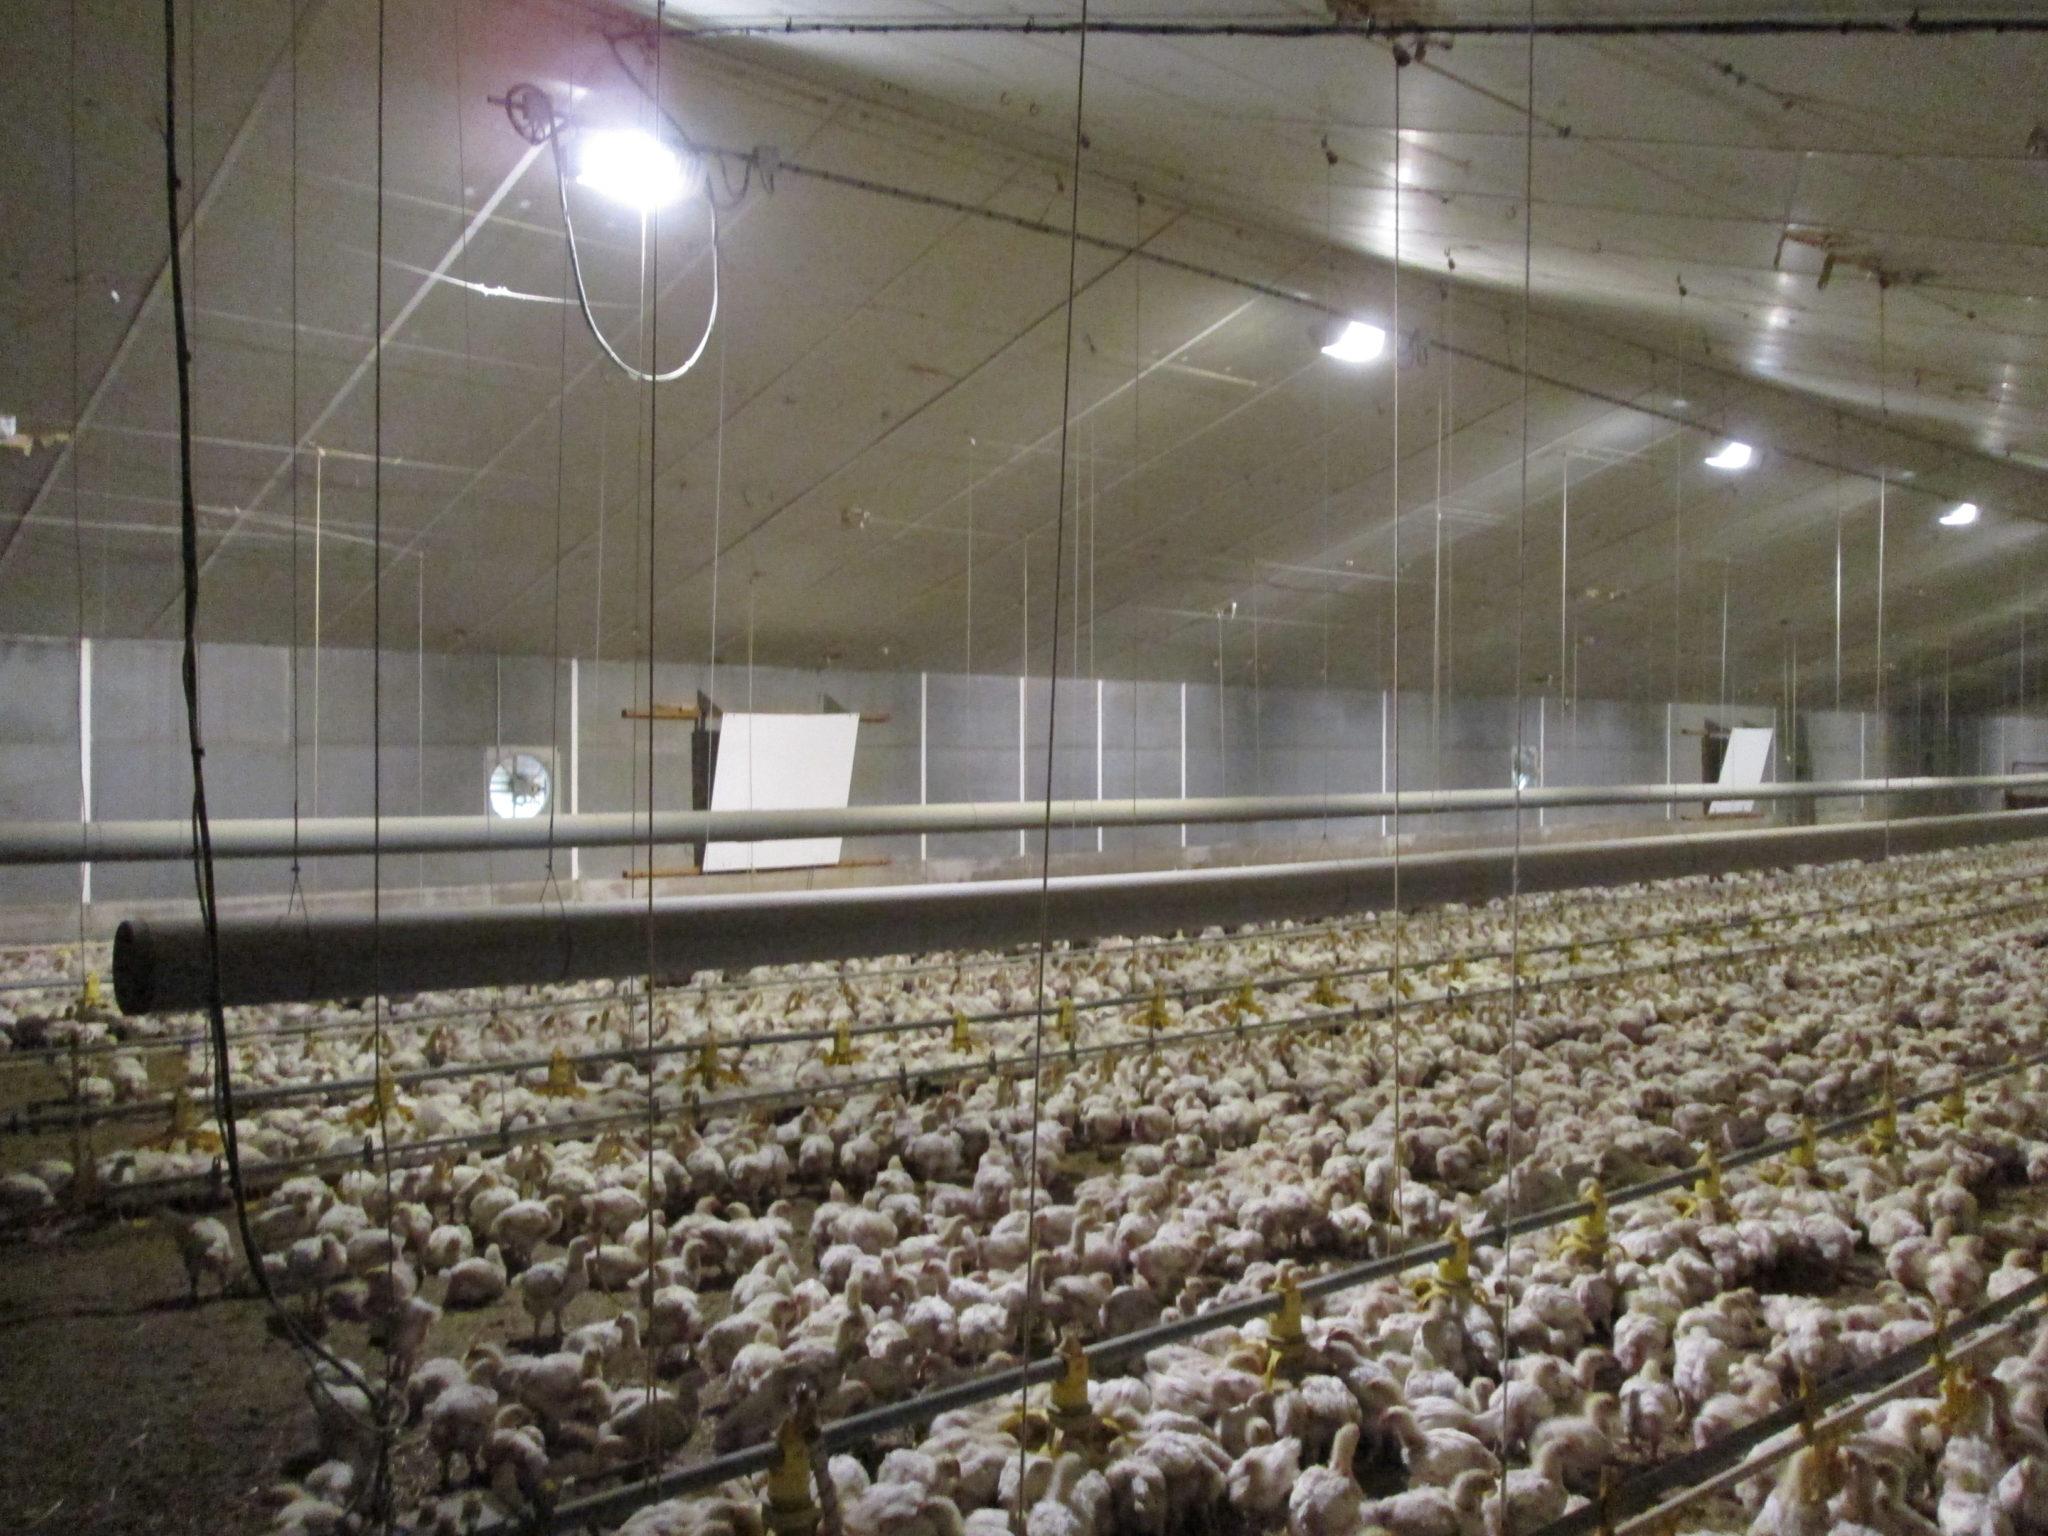 Stal Jéhannin LED Stallbeleuchtung Geflügel LED Stalverlichting kippen LED d'éclairage Volaille LED barn lighting broilers